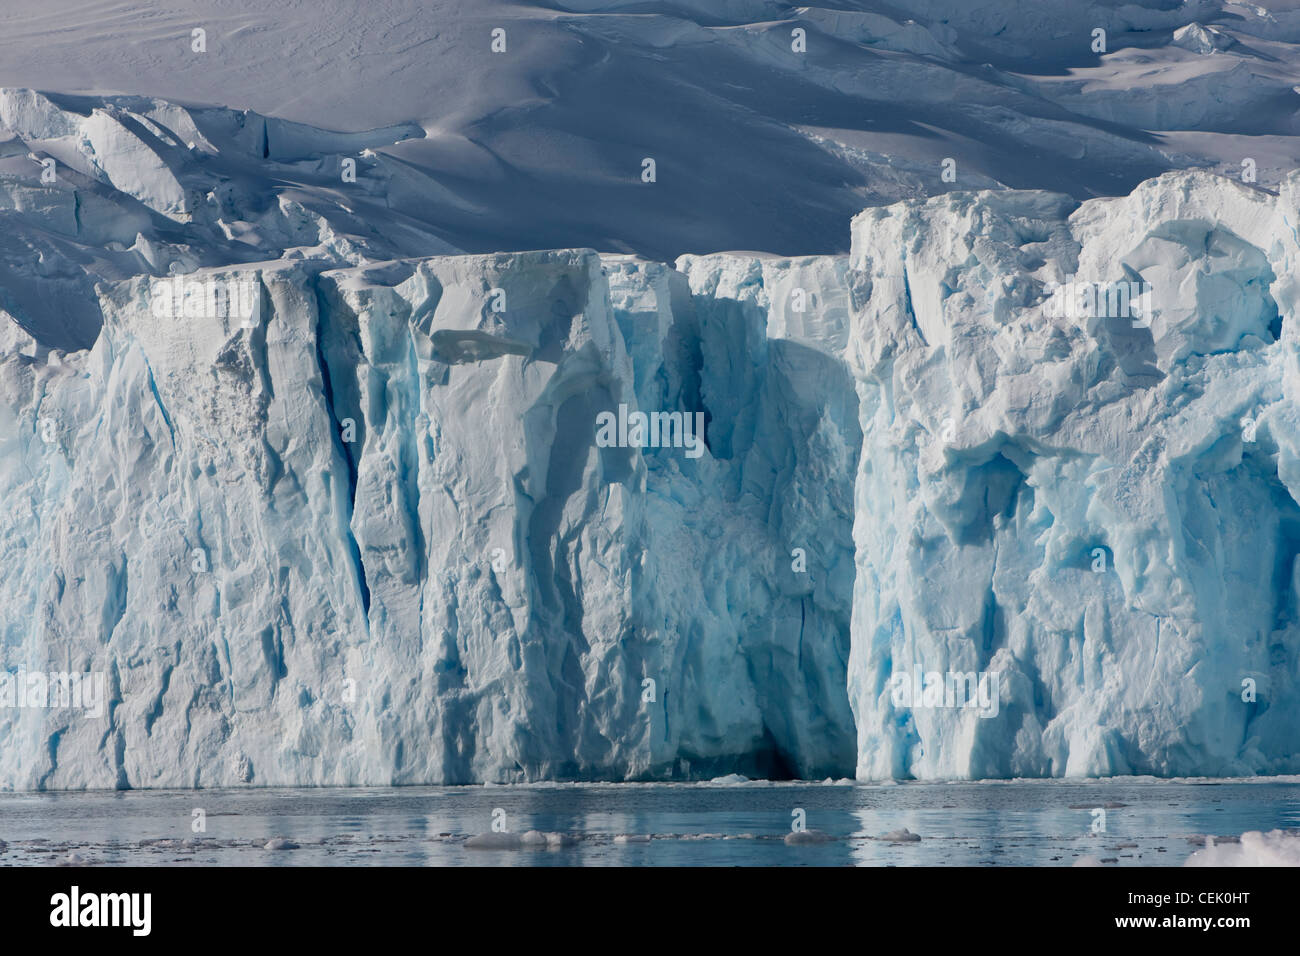 Glacier in the Southern ocean Antarctica Stock Photo